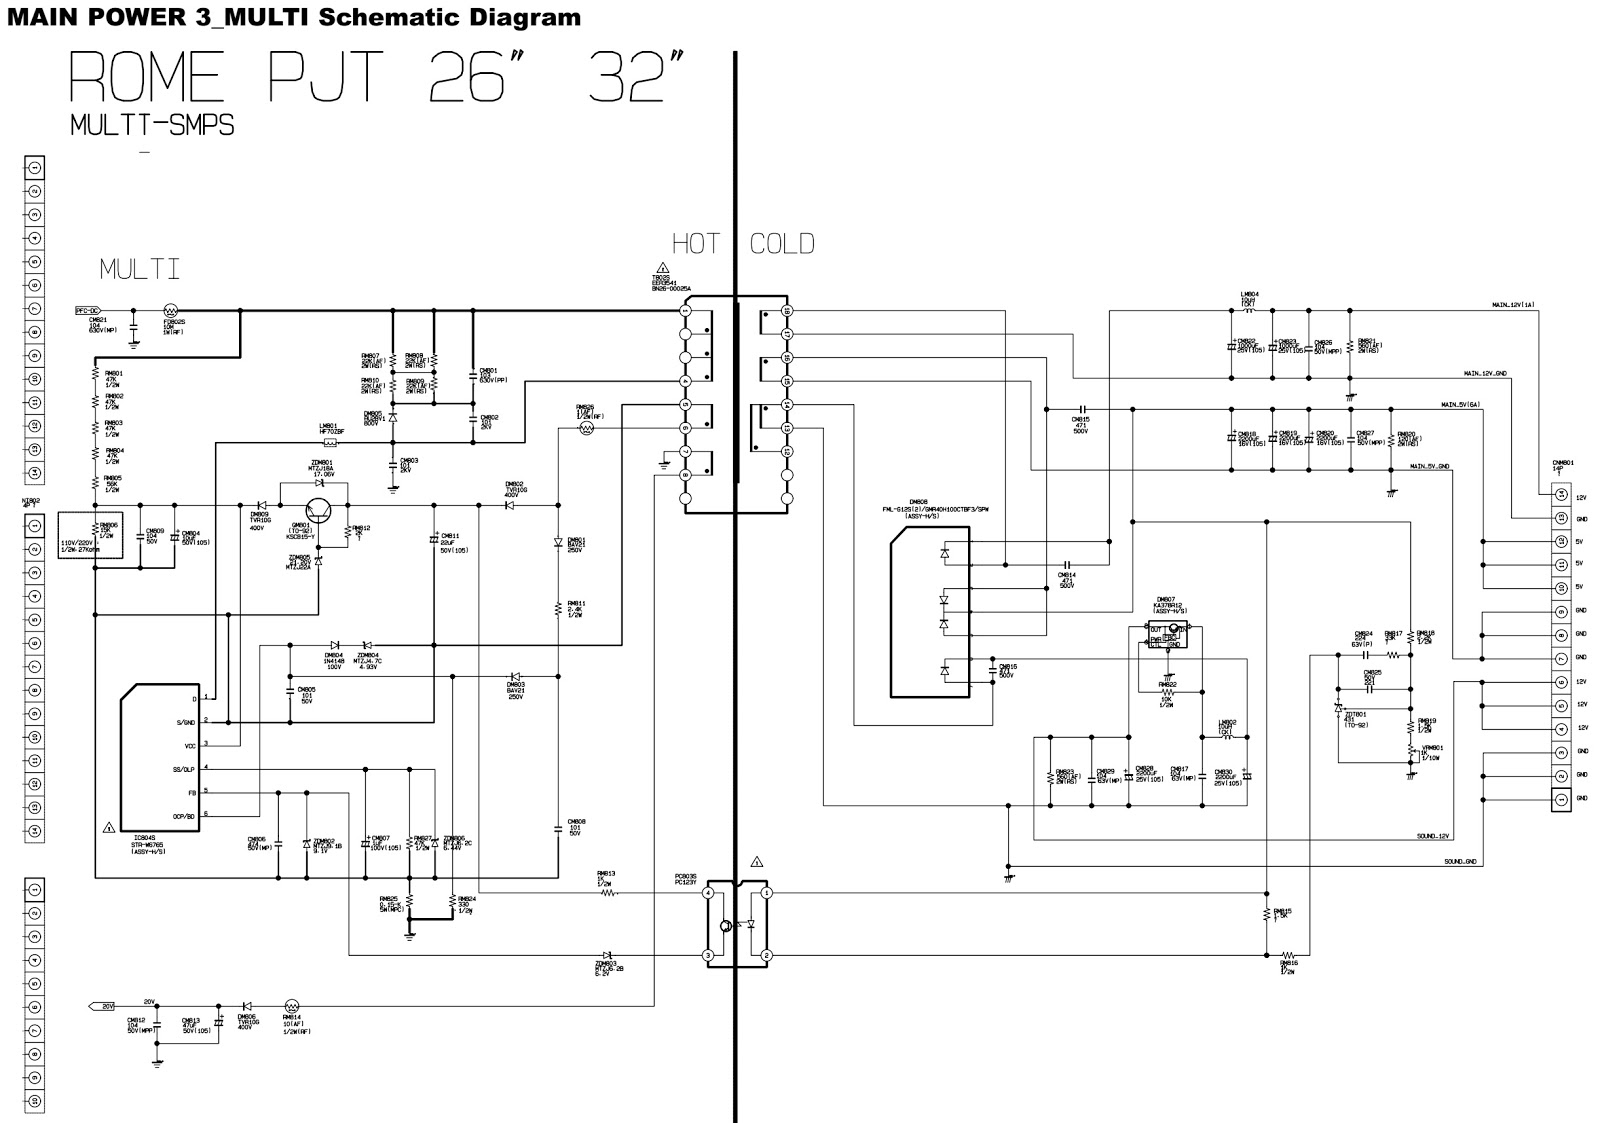 led circuit diagram samsung wiring diagram online Asus Wiring Diagram led circuit diagram samsung wiring diagram samsung led circuit diagram led circuit diagram samsung